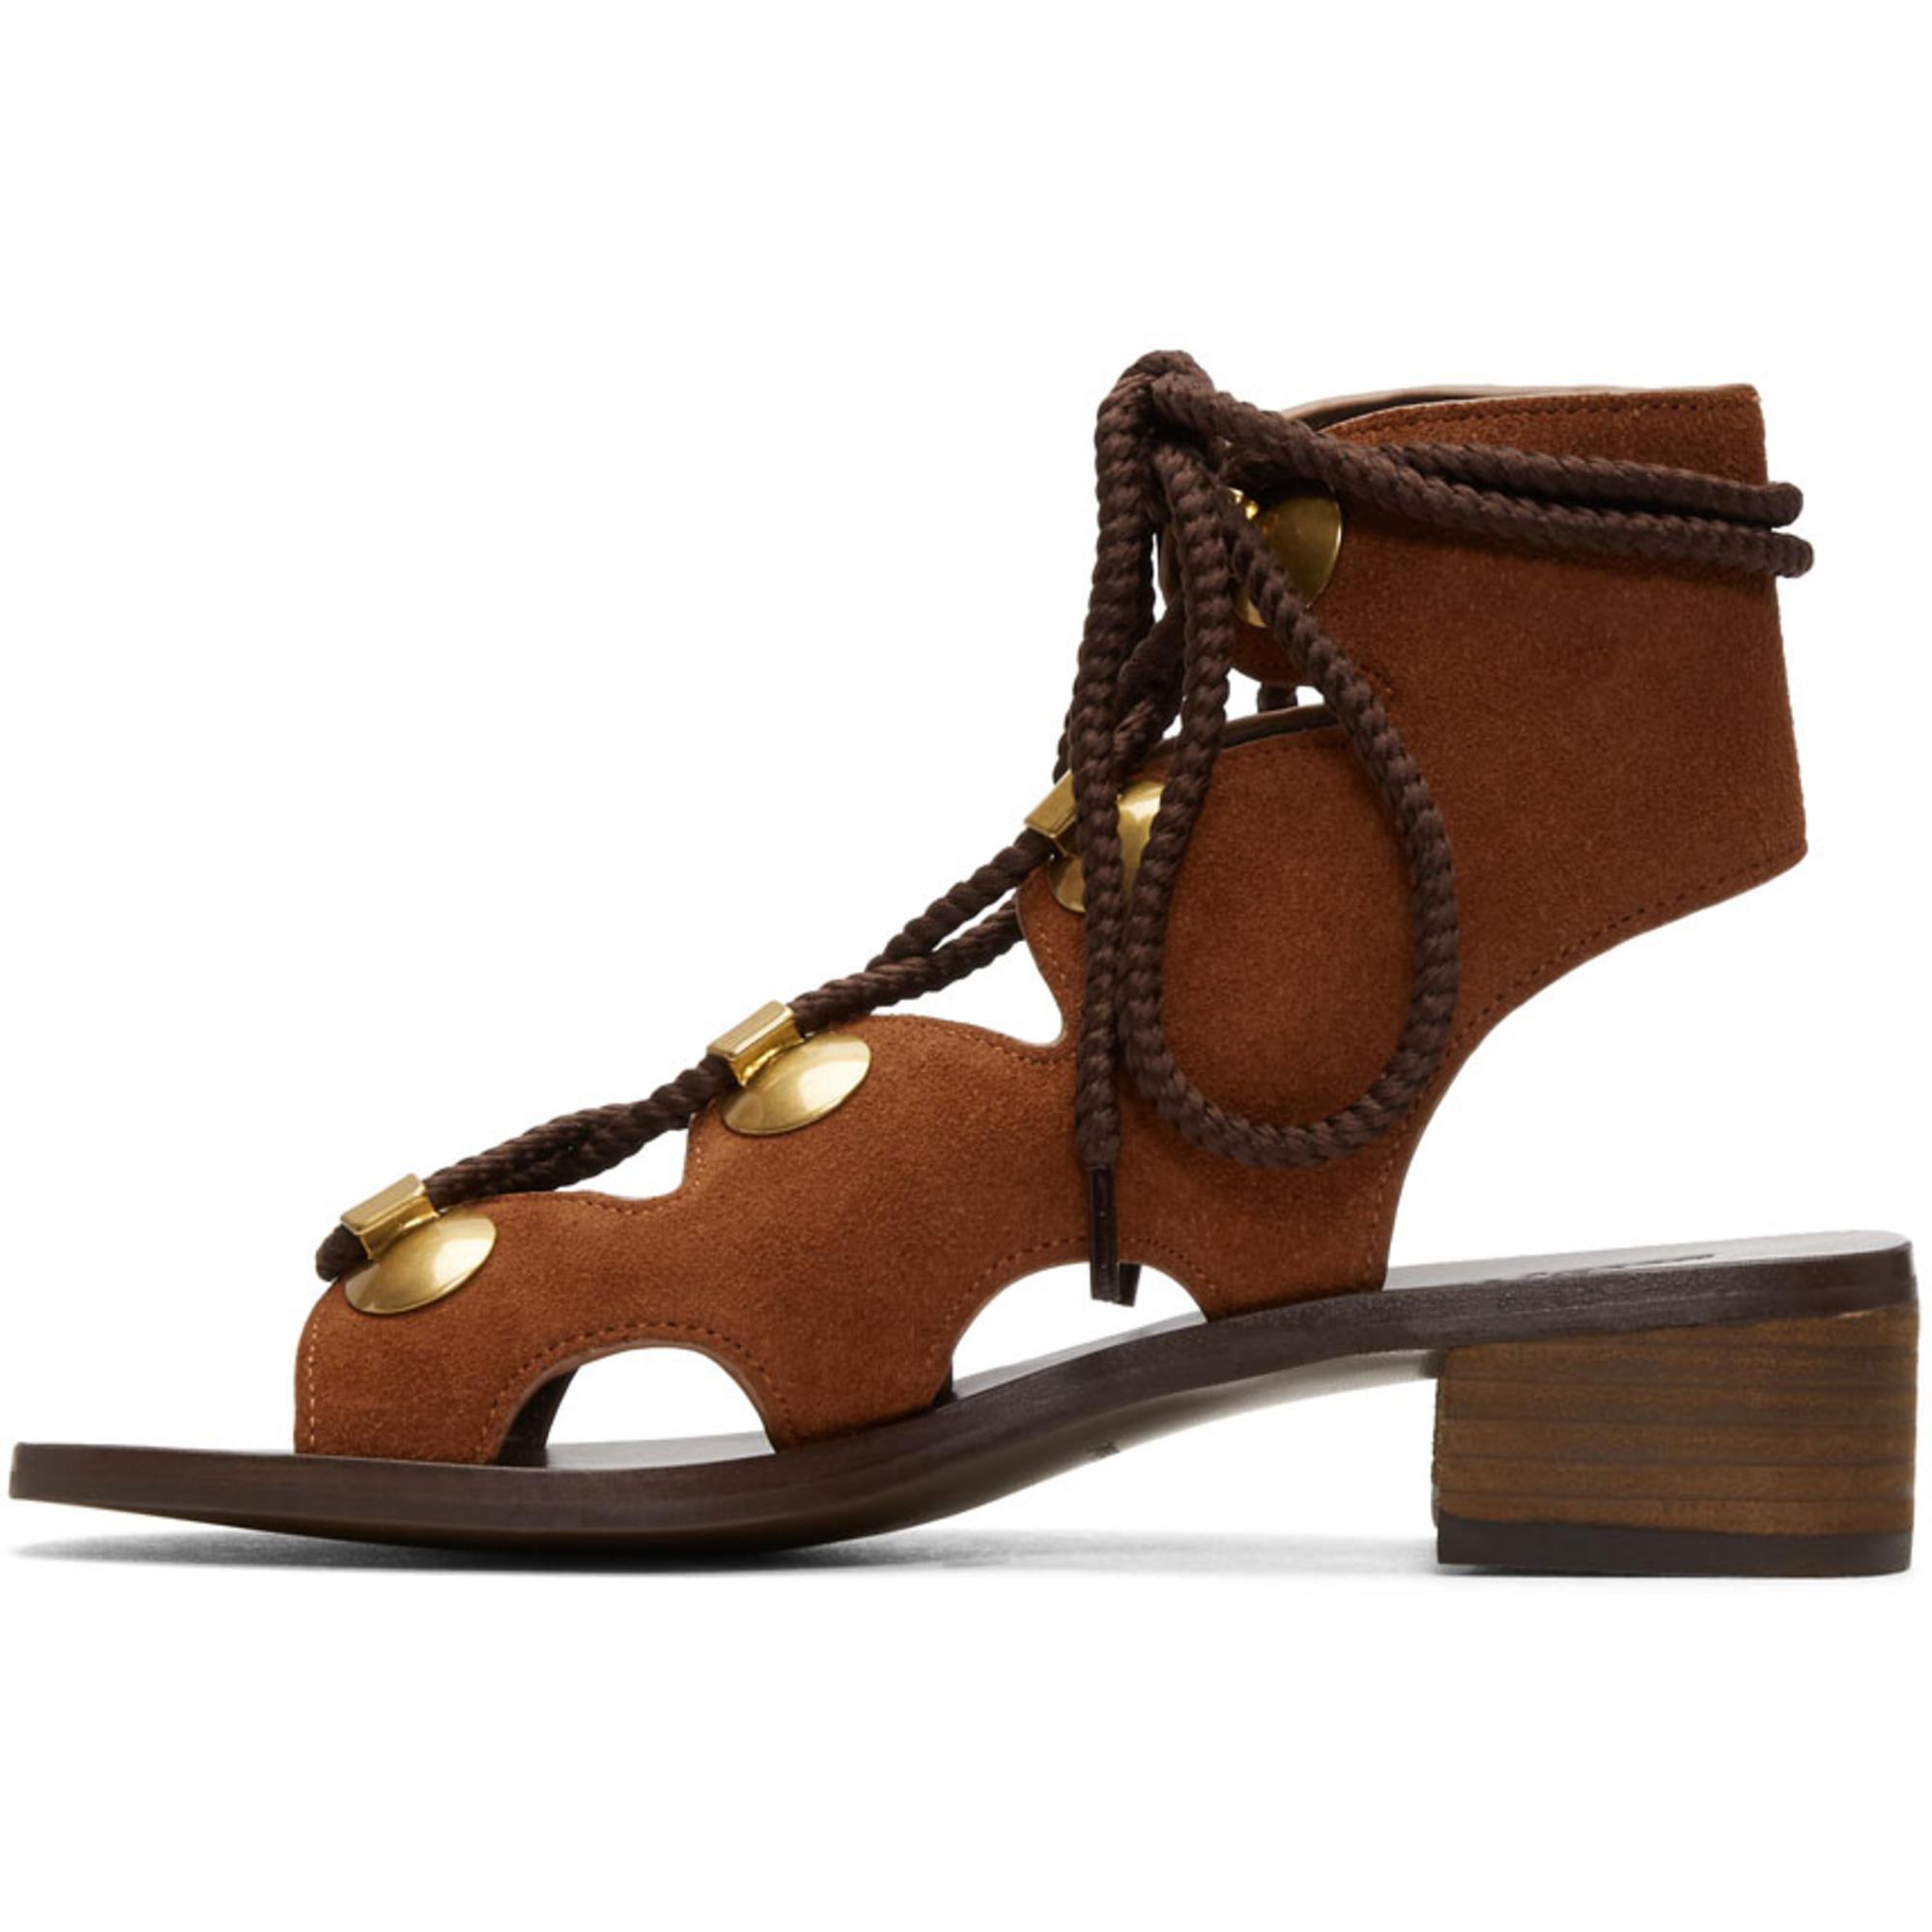 See by Chloé Orange Suede Gladiator Tie Sandals qcQTMY